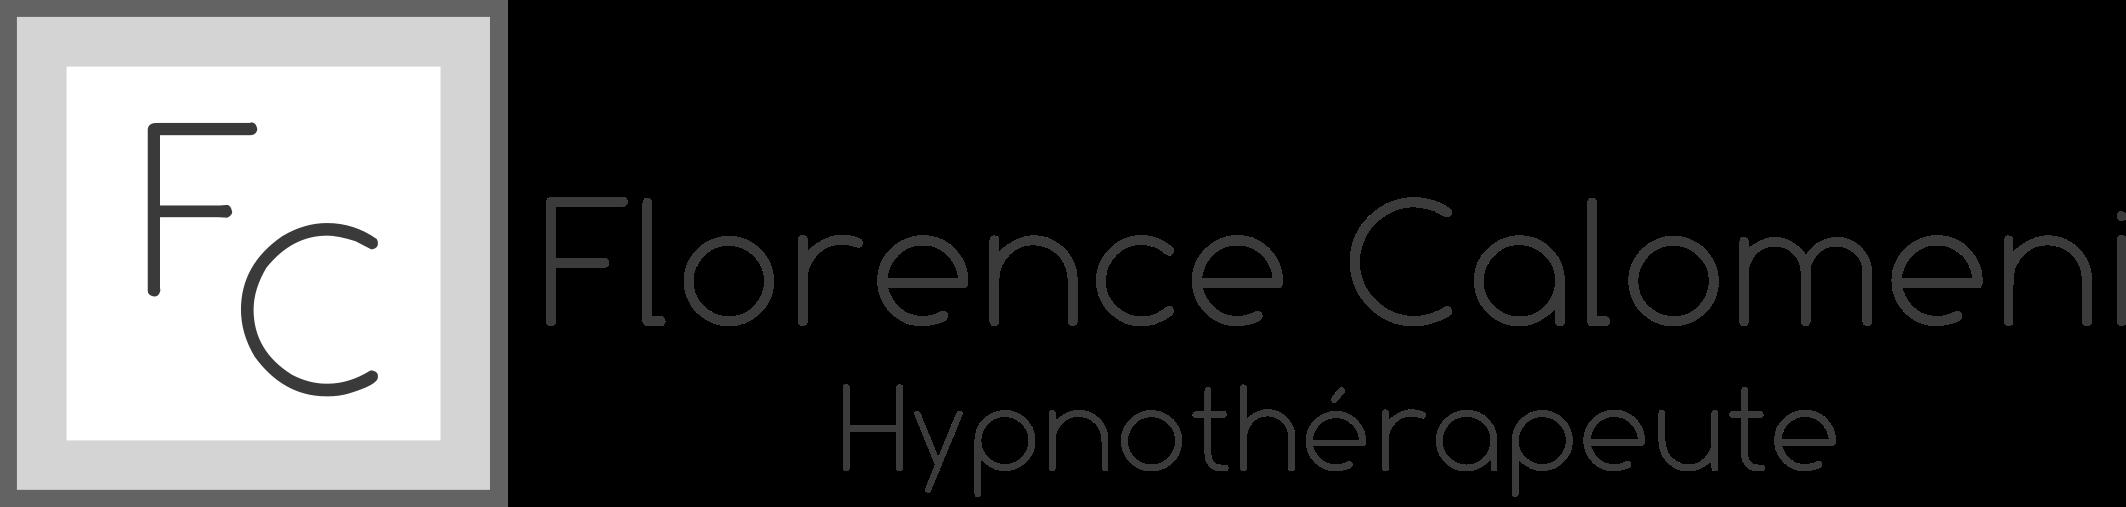 Florence Noël Calomeni - Cabinet hypnothérapie - Genève